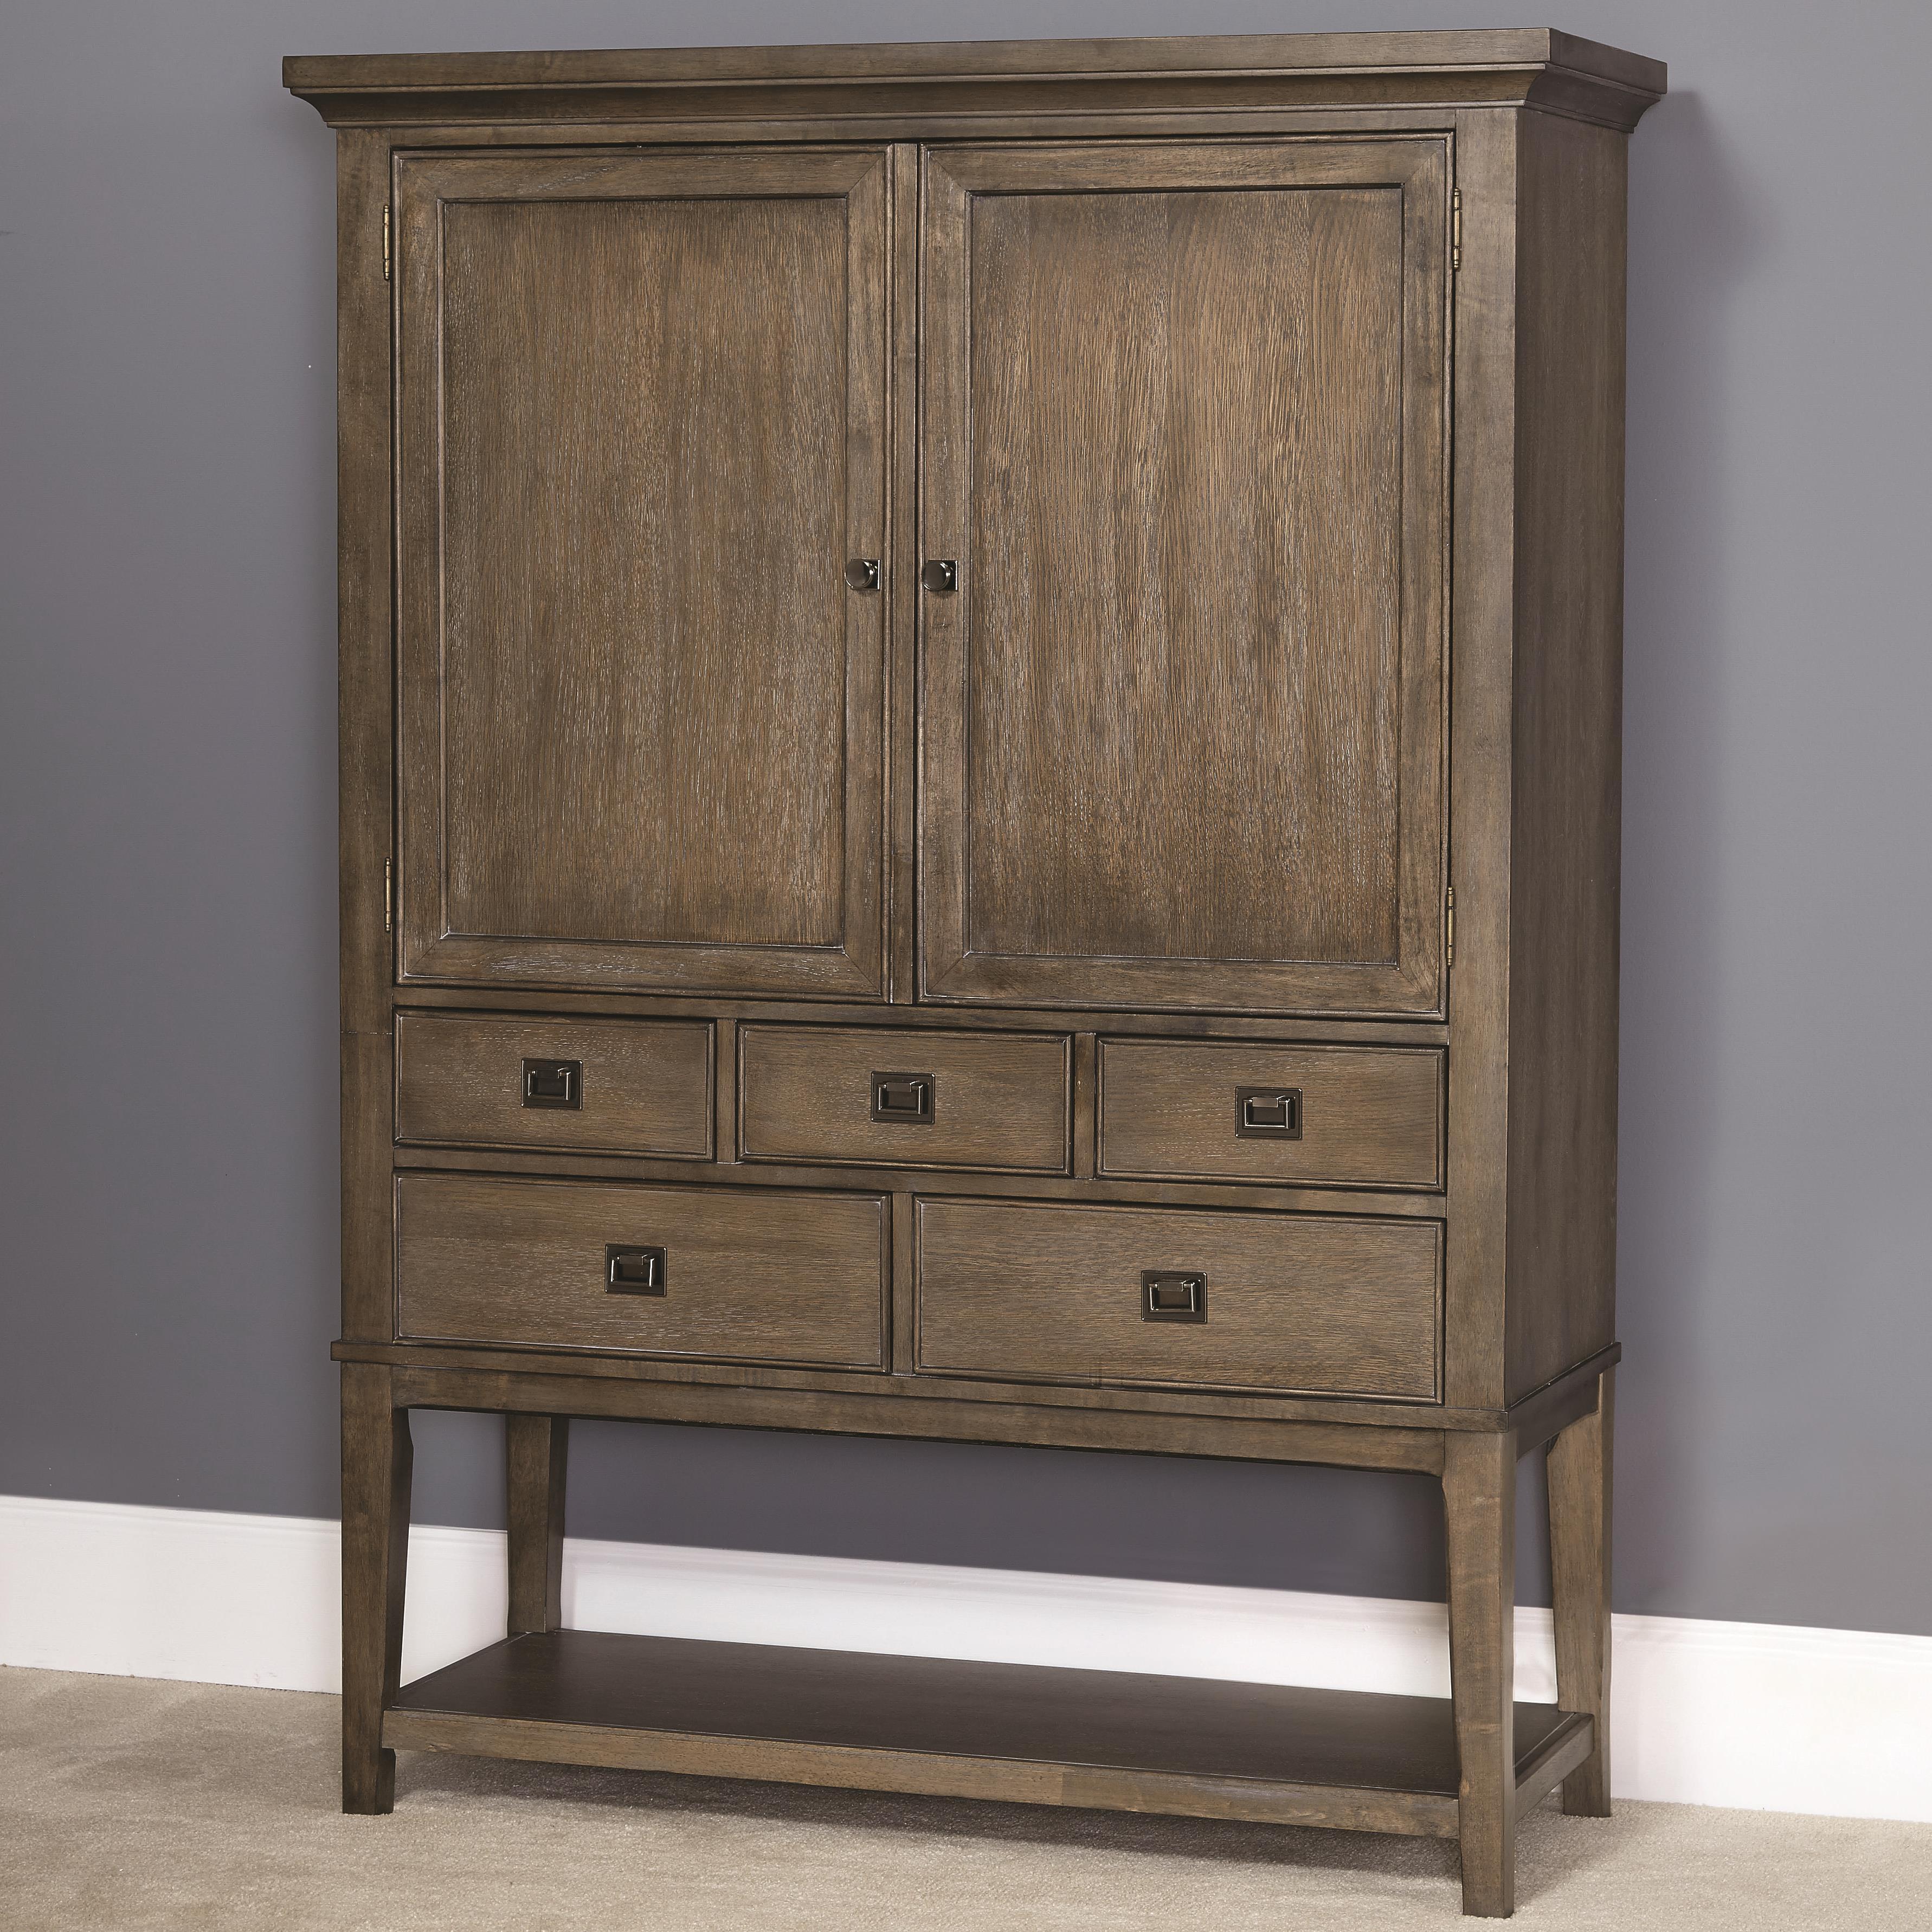 American Drew Park Studio Bar Cabinet - Item Number: 488-891